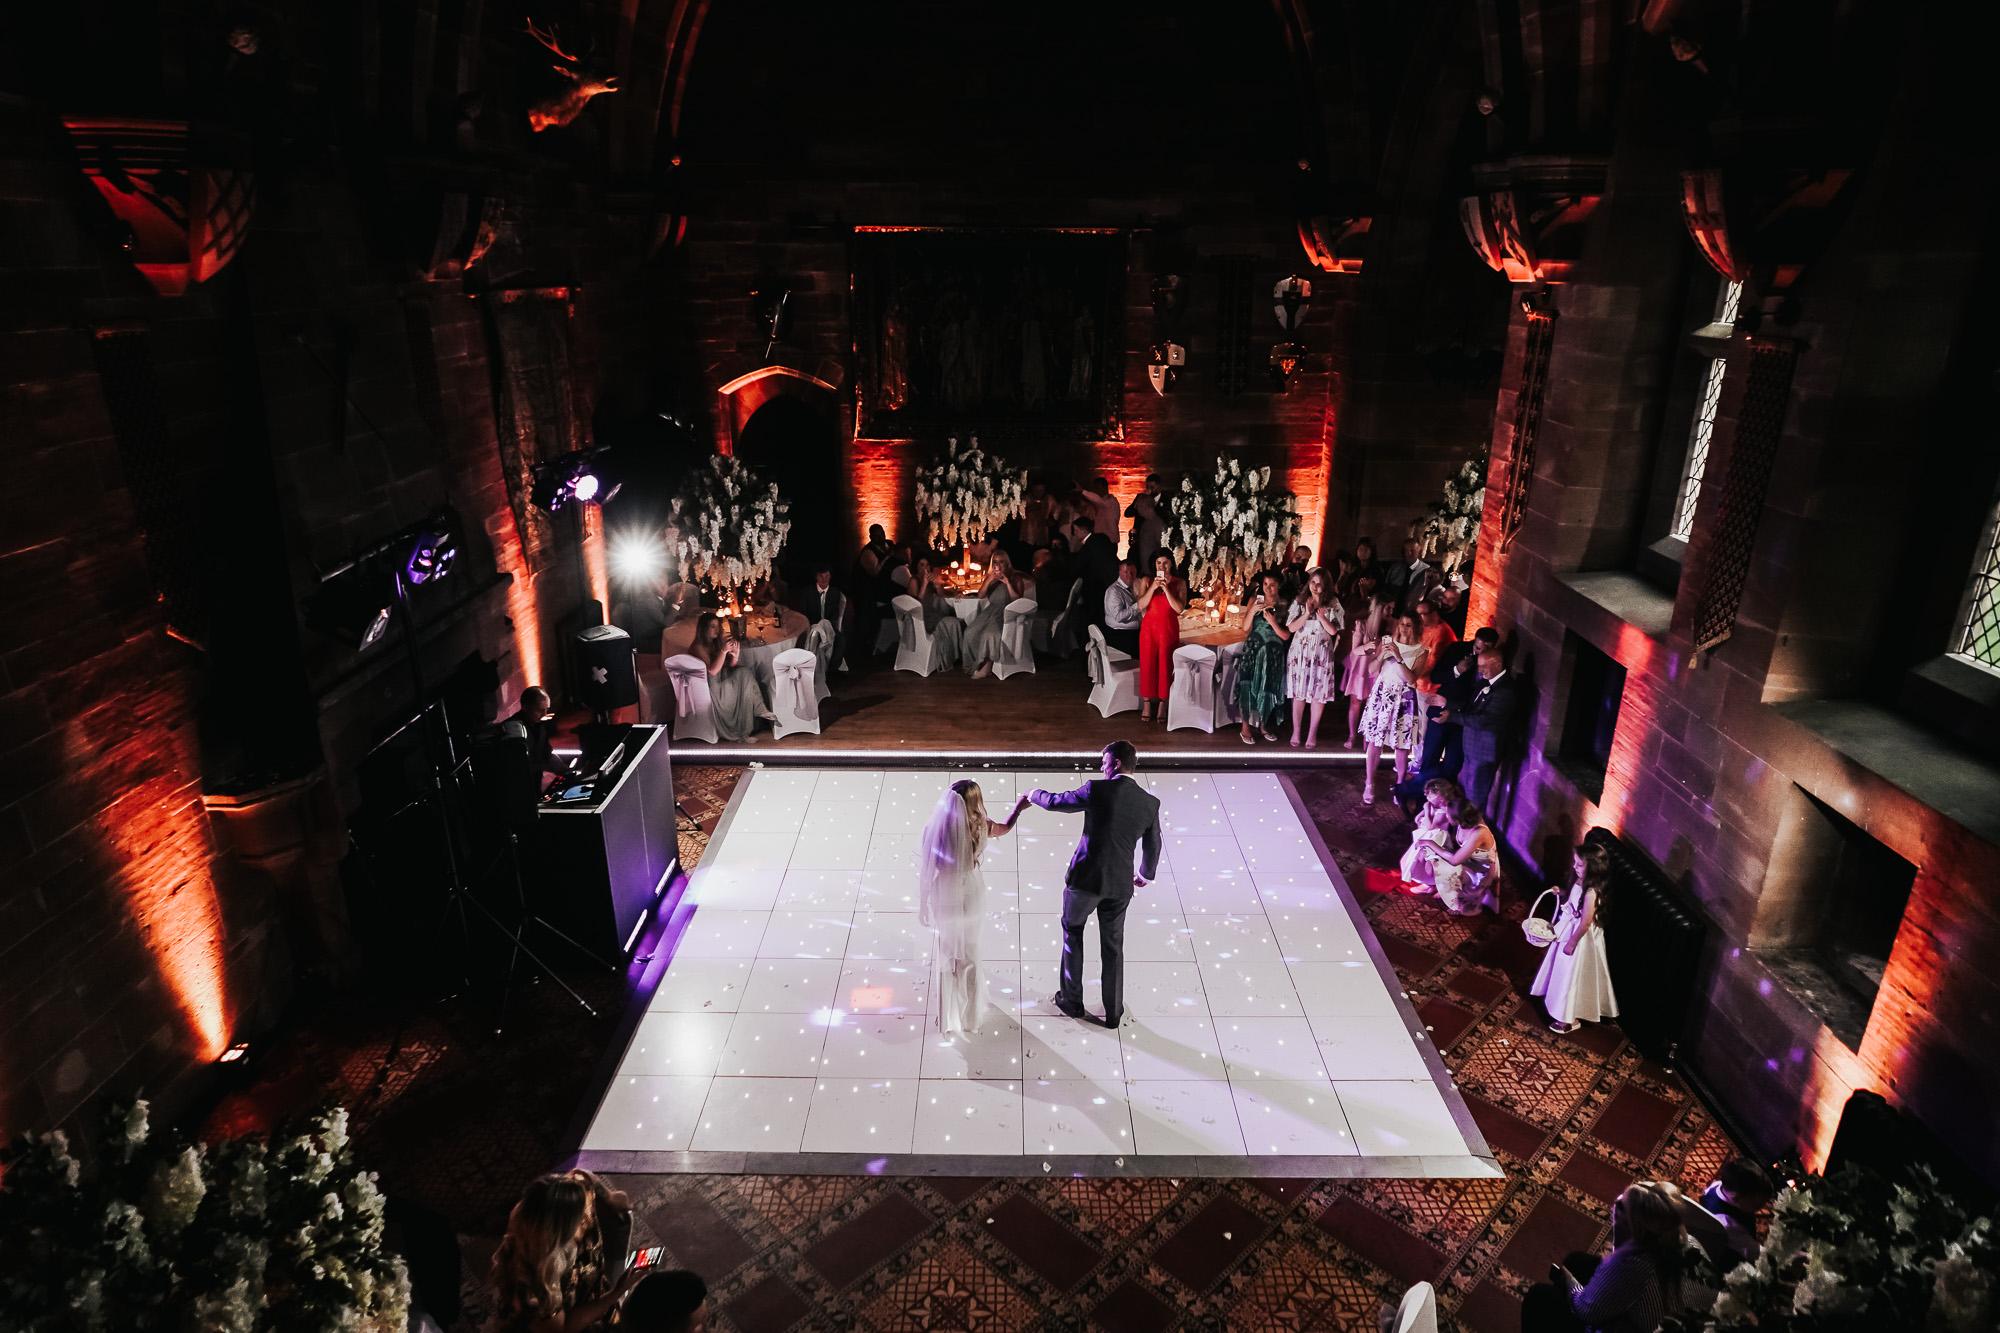 Peckforton Castle wedding photography cheshire wedding photographer (53 of 57).jpg